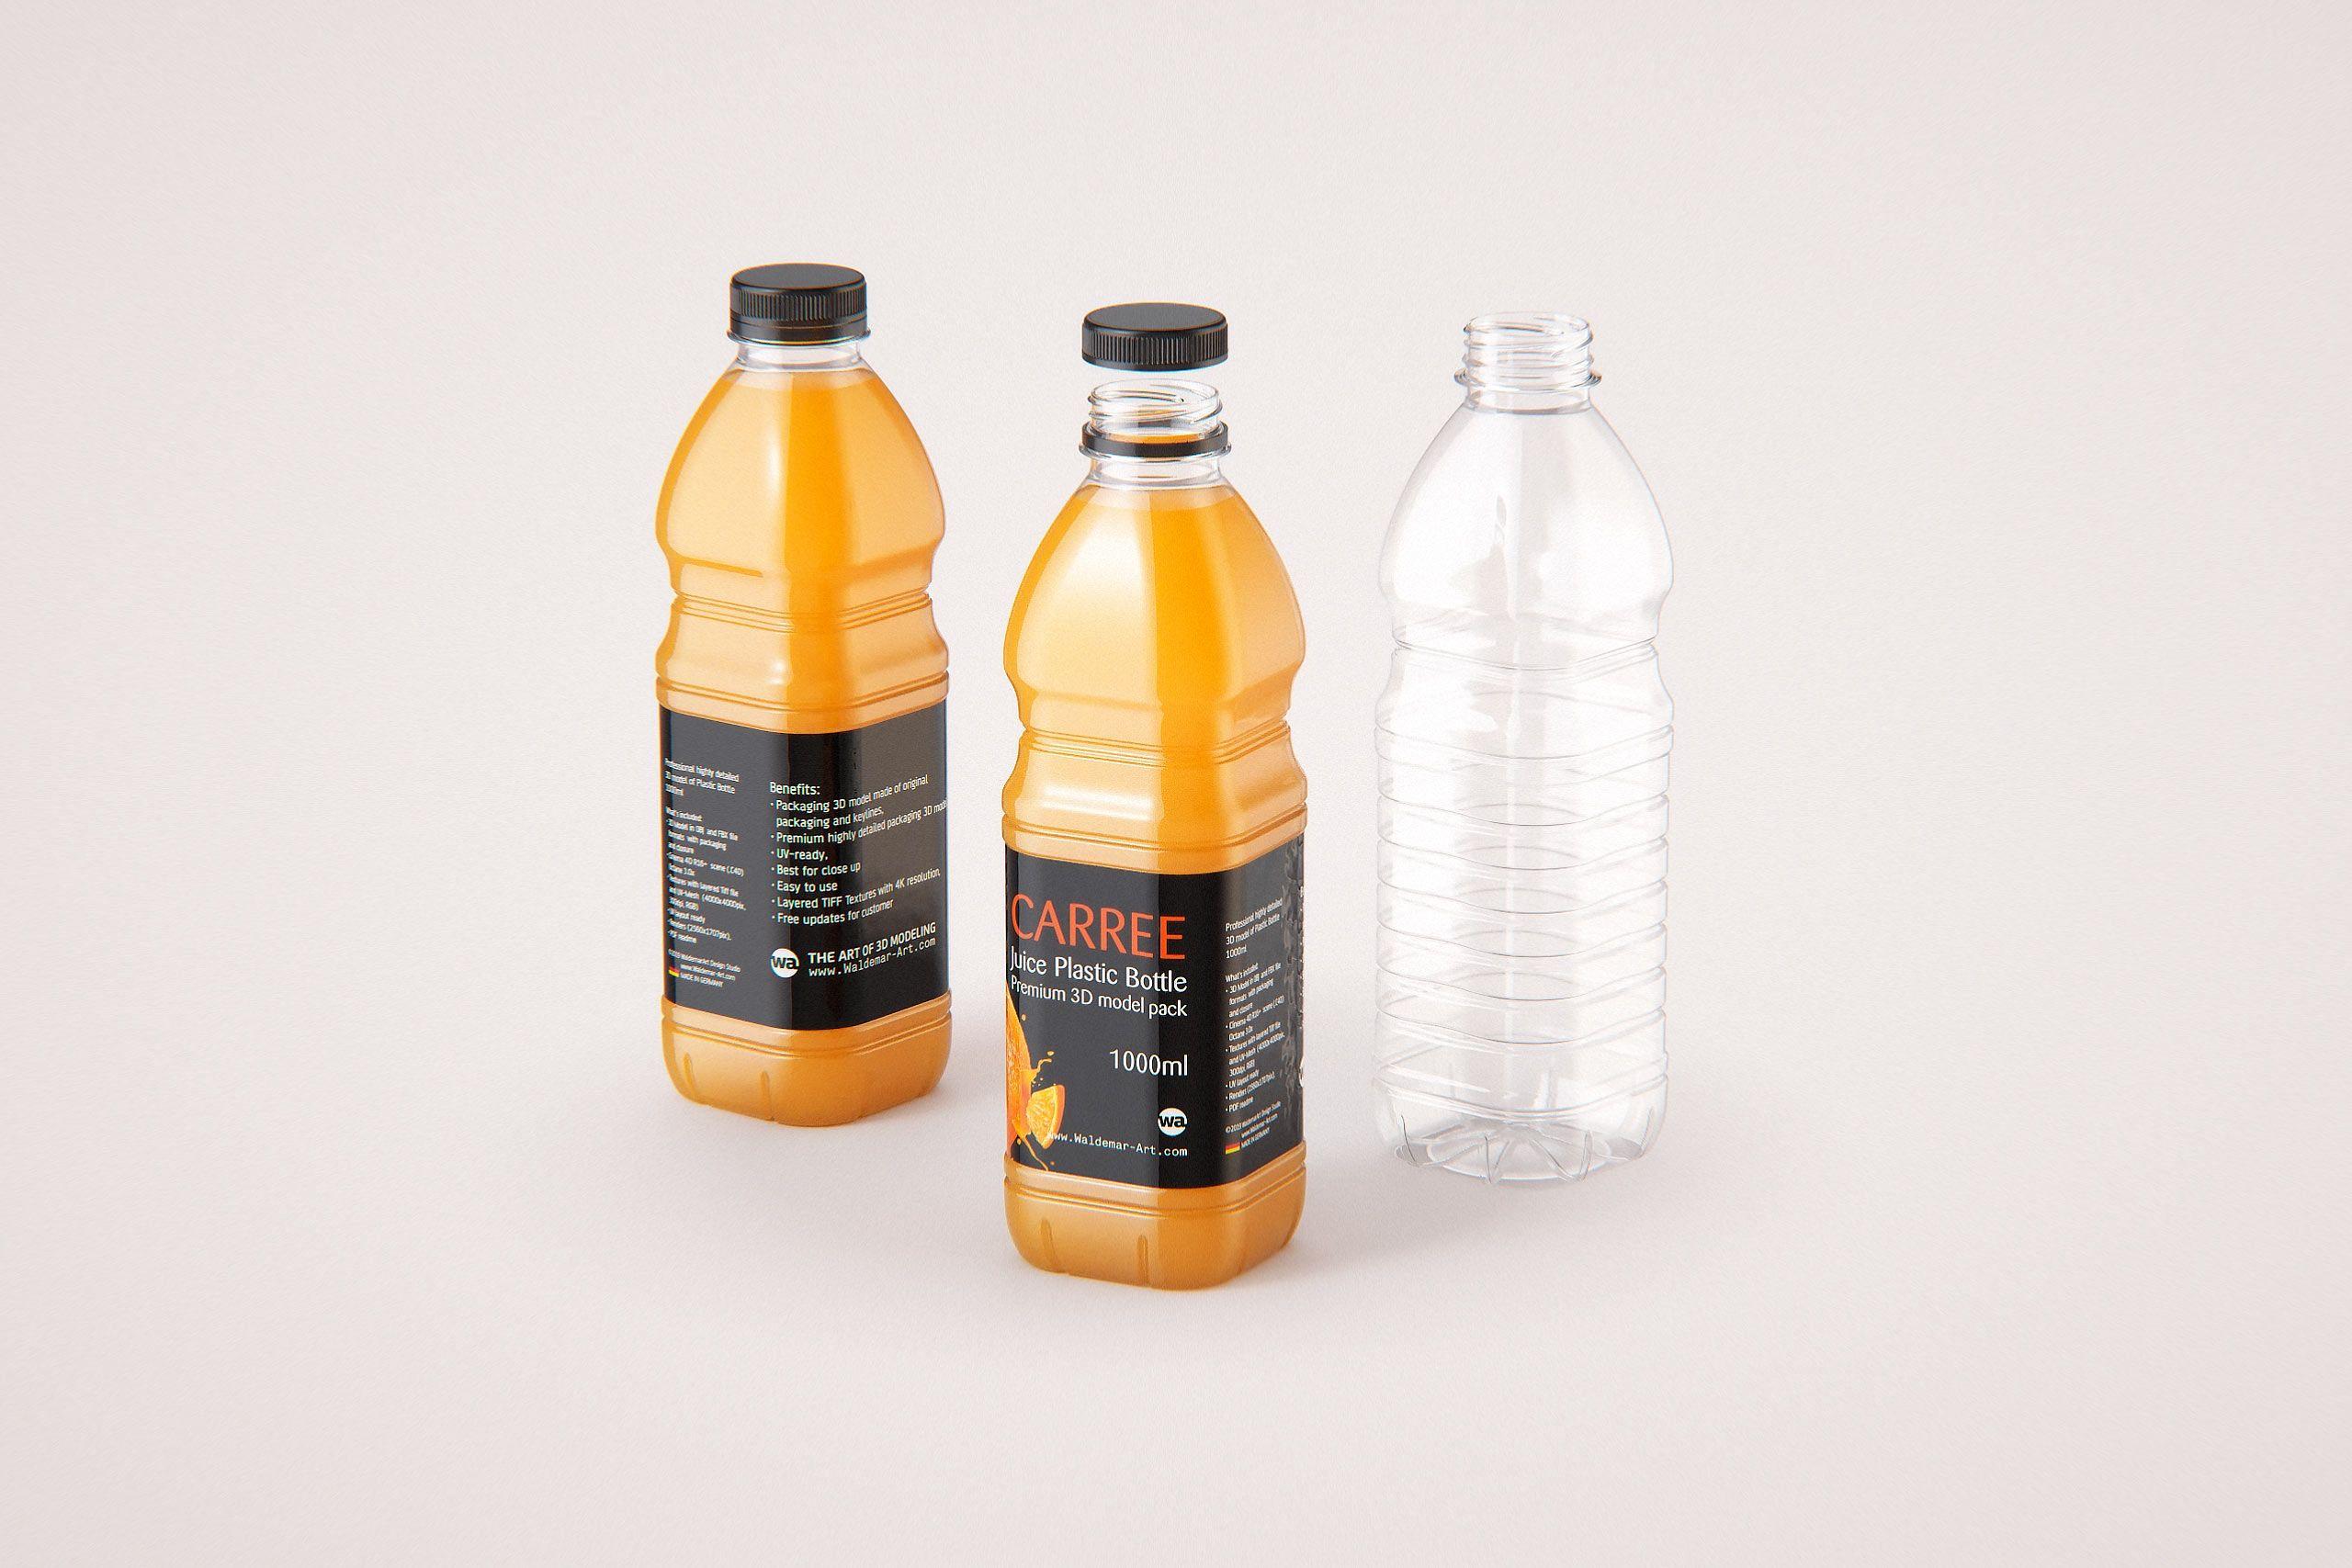 Carree Juice PET Plastic Bottle 1000ml packaging 3d model